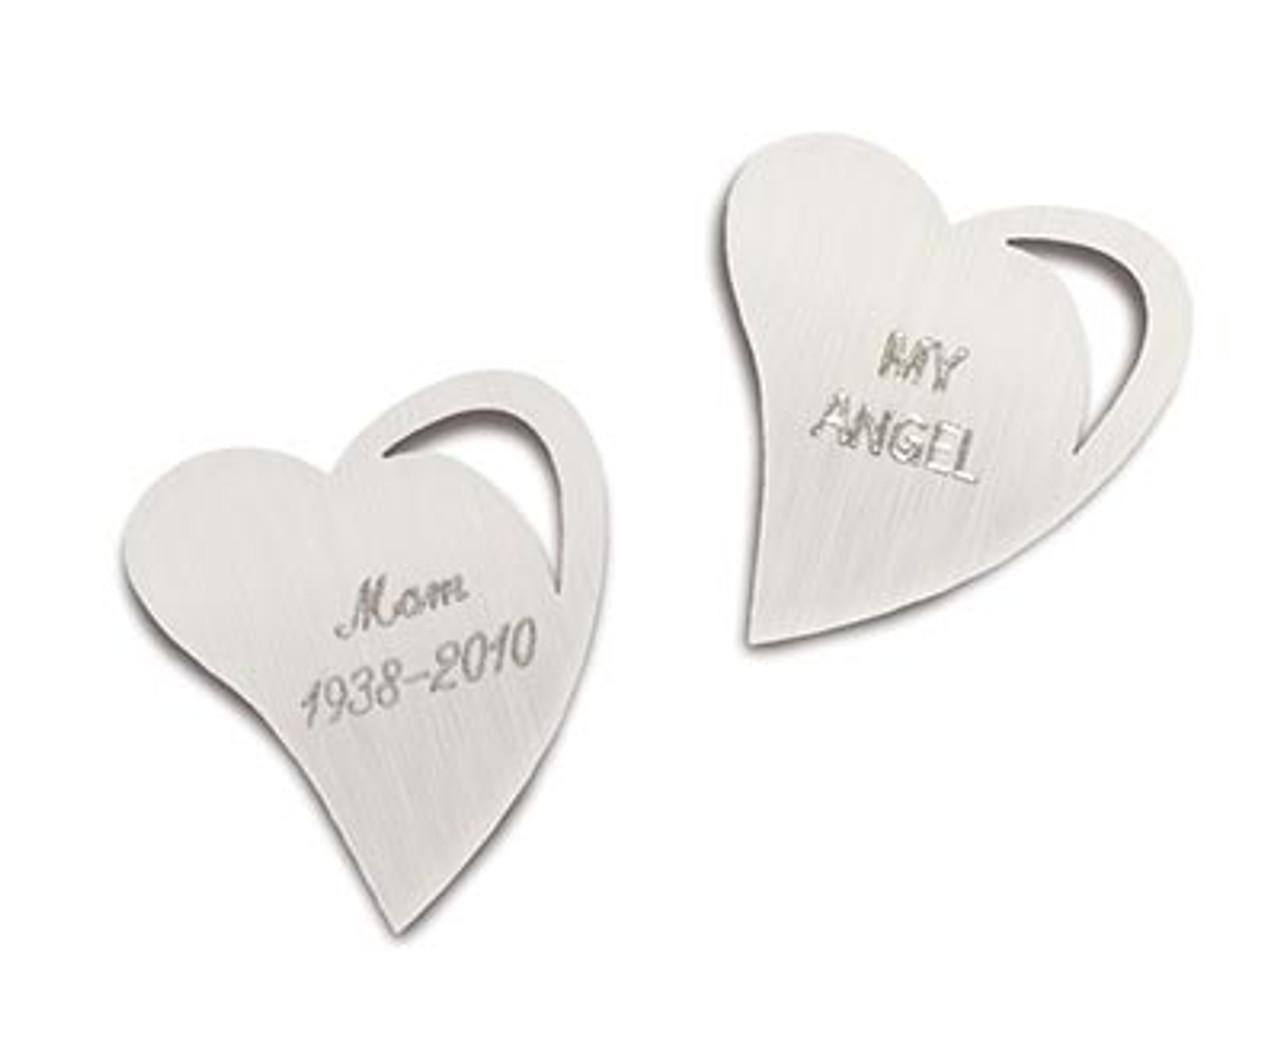 Engraving for Open Heart Noble Bronze Pendants (BACK)